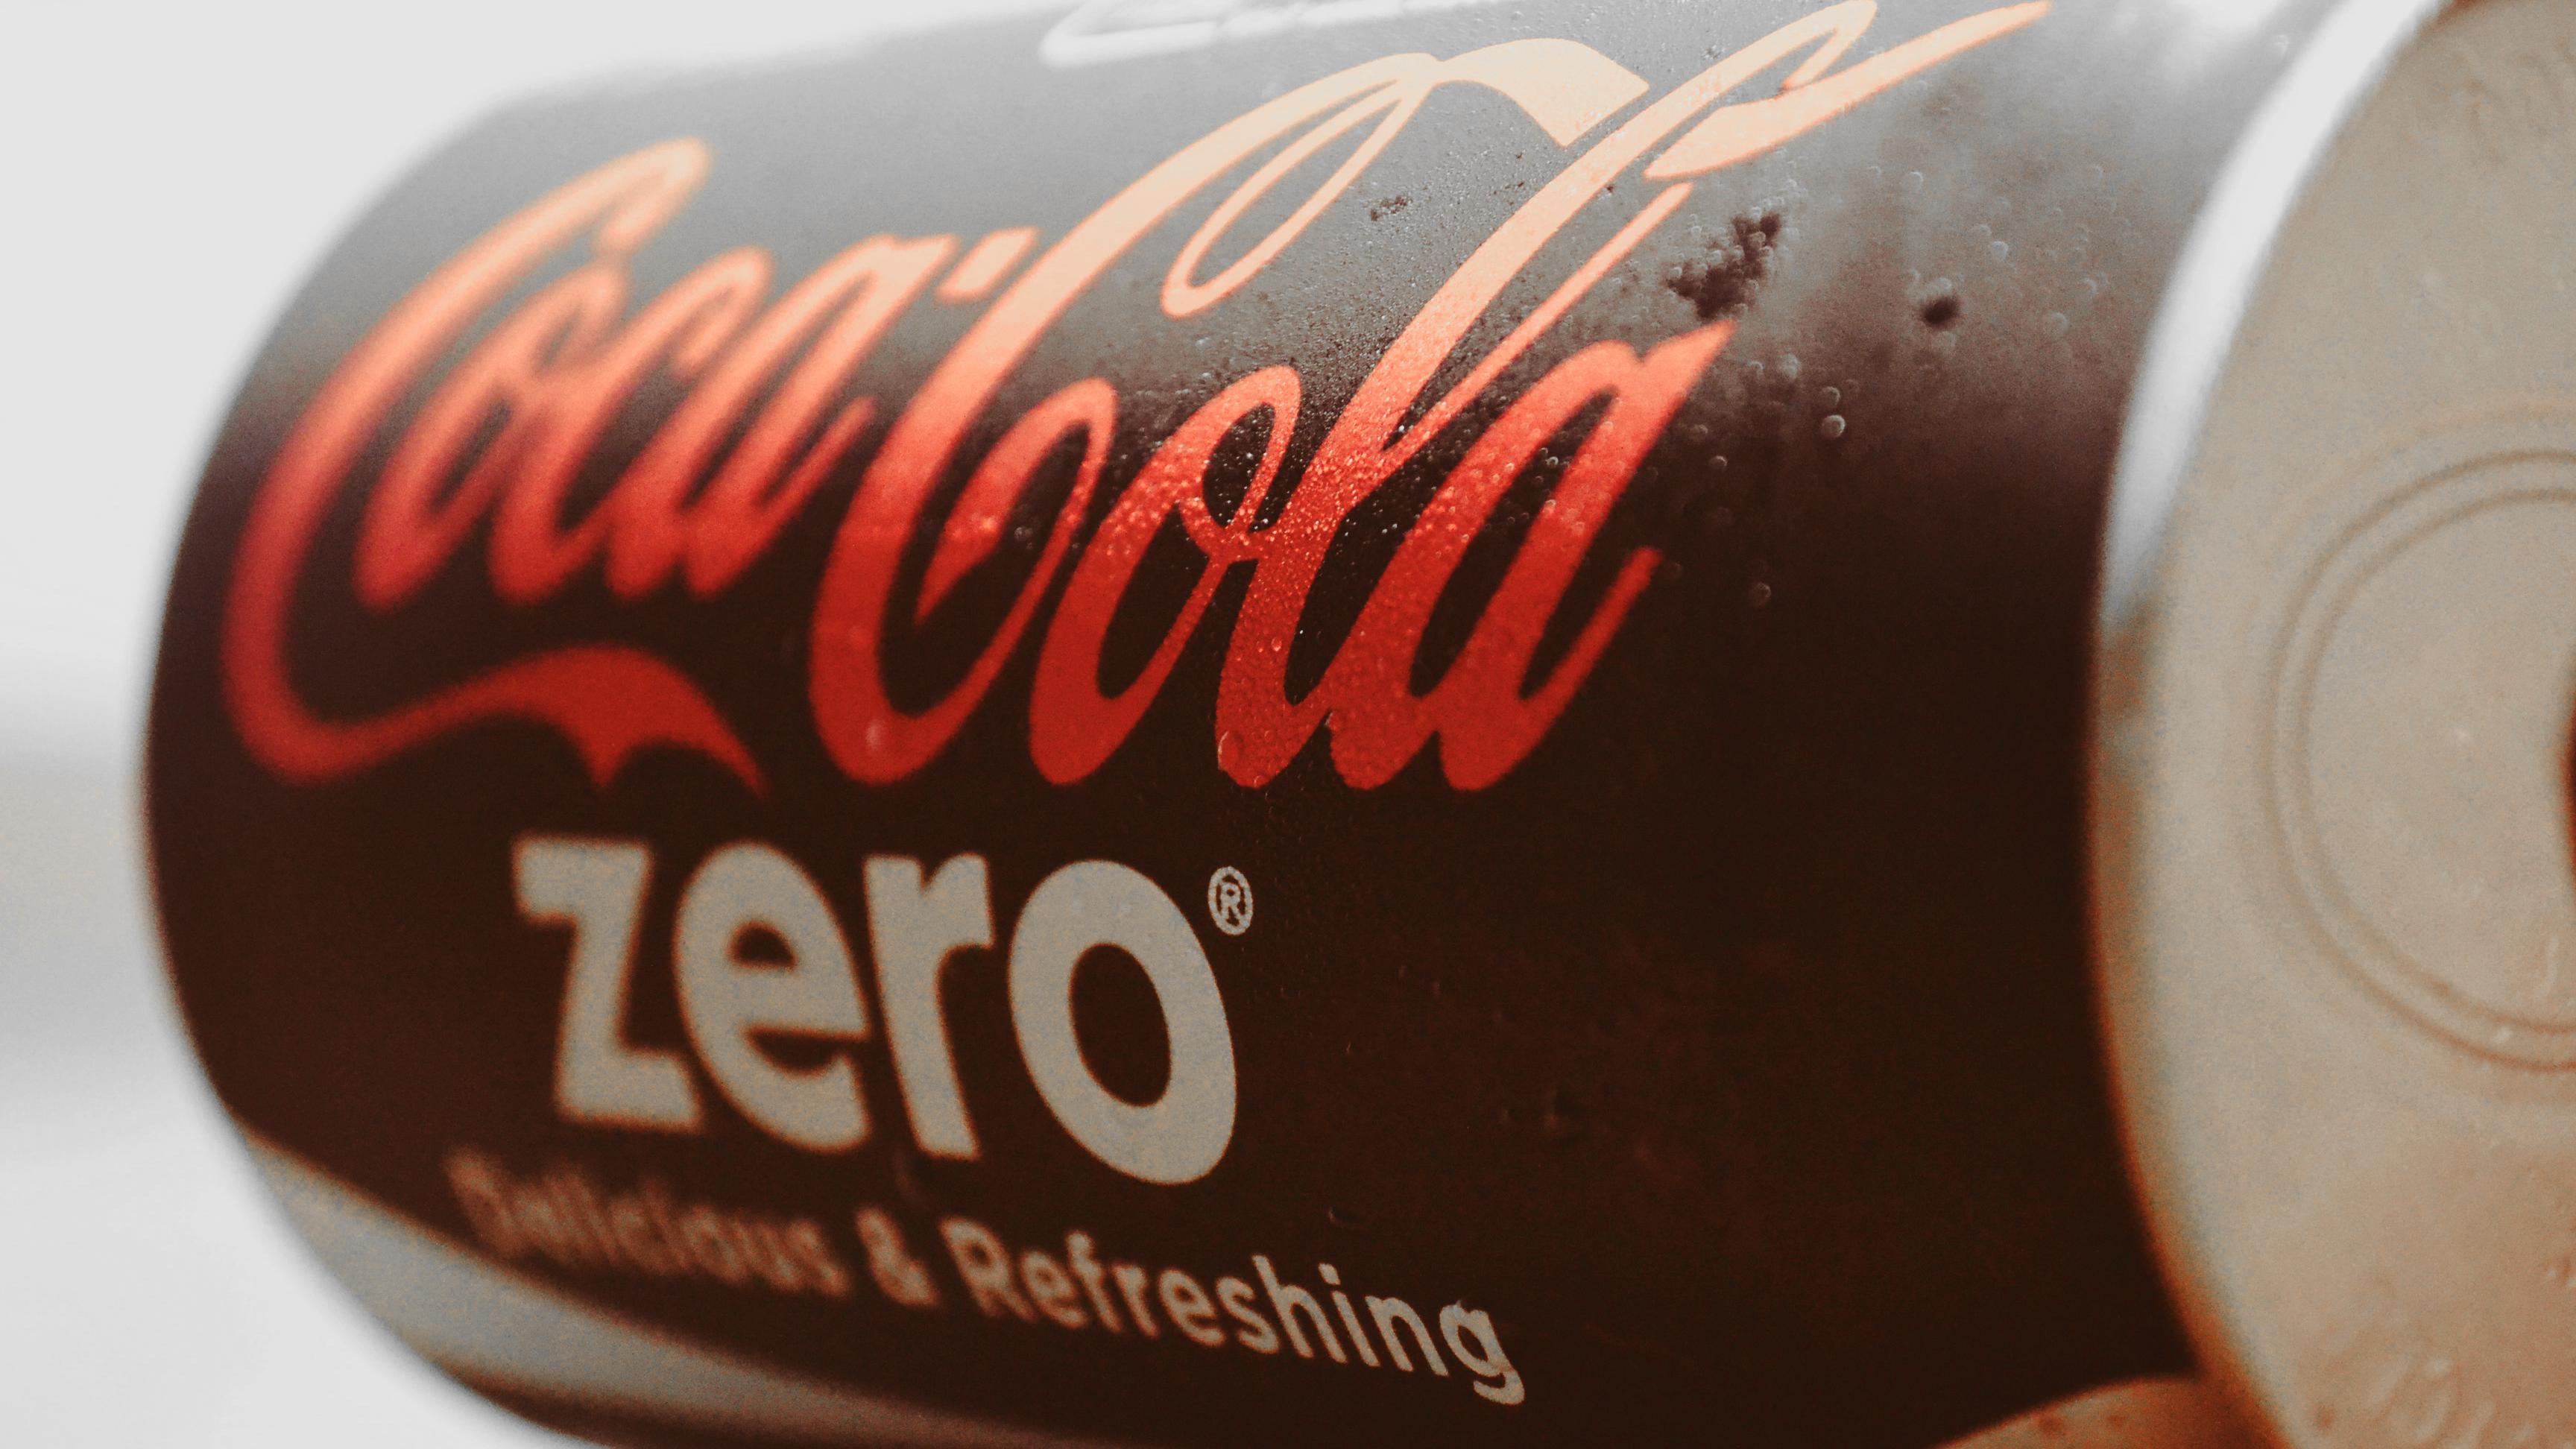 Coke Zero Was A Bullcrap Drink From The Beginning